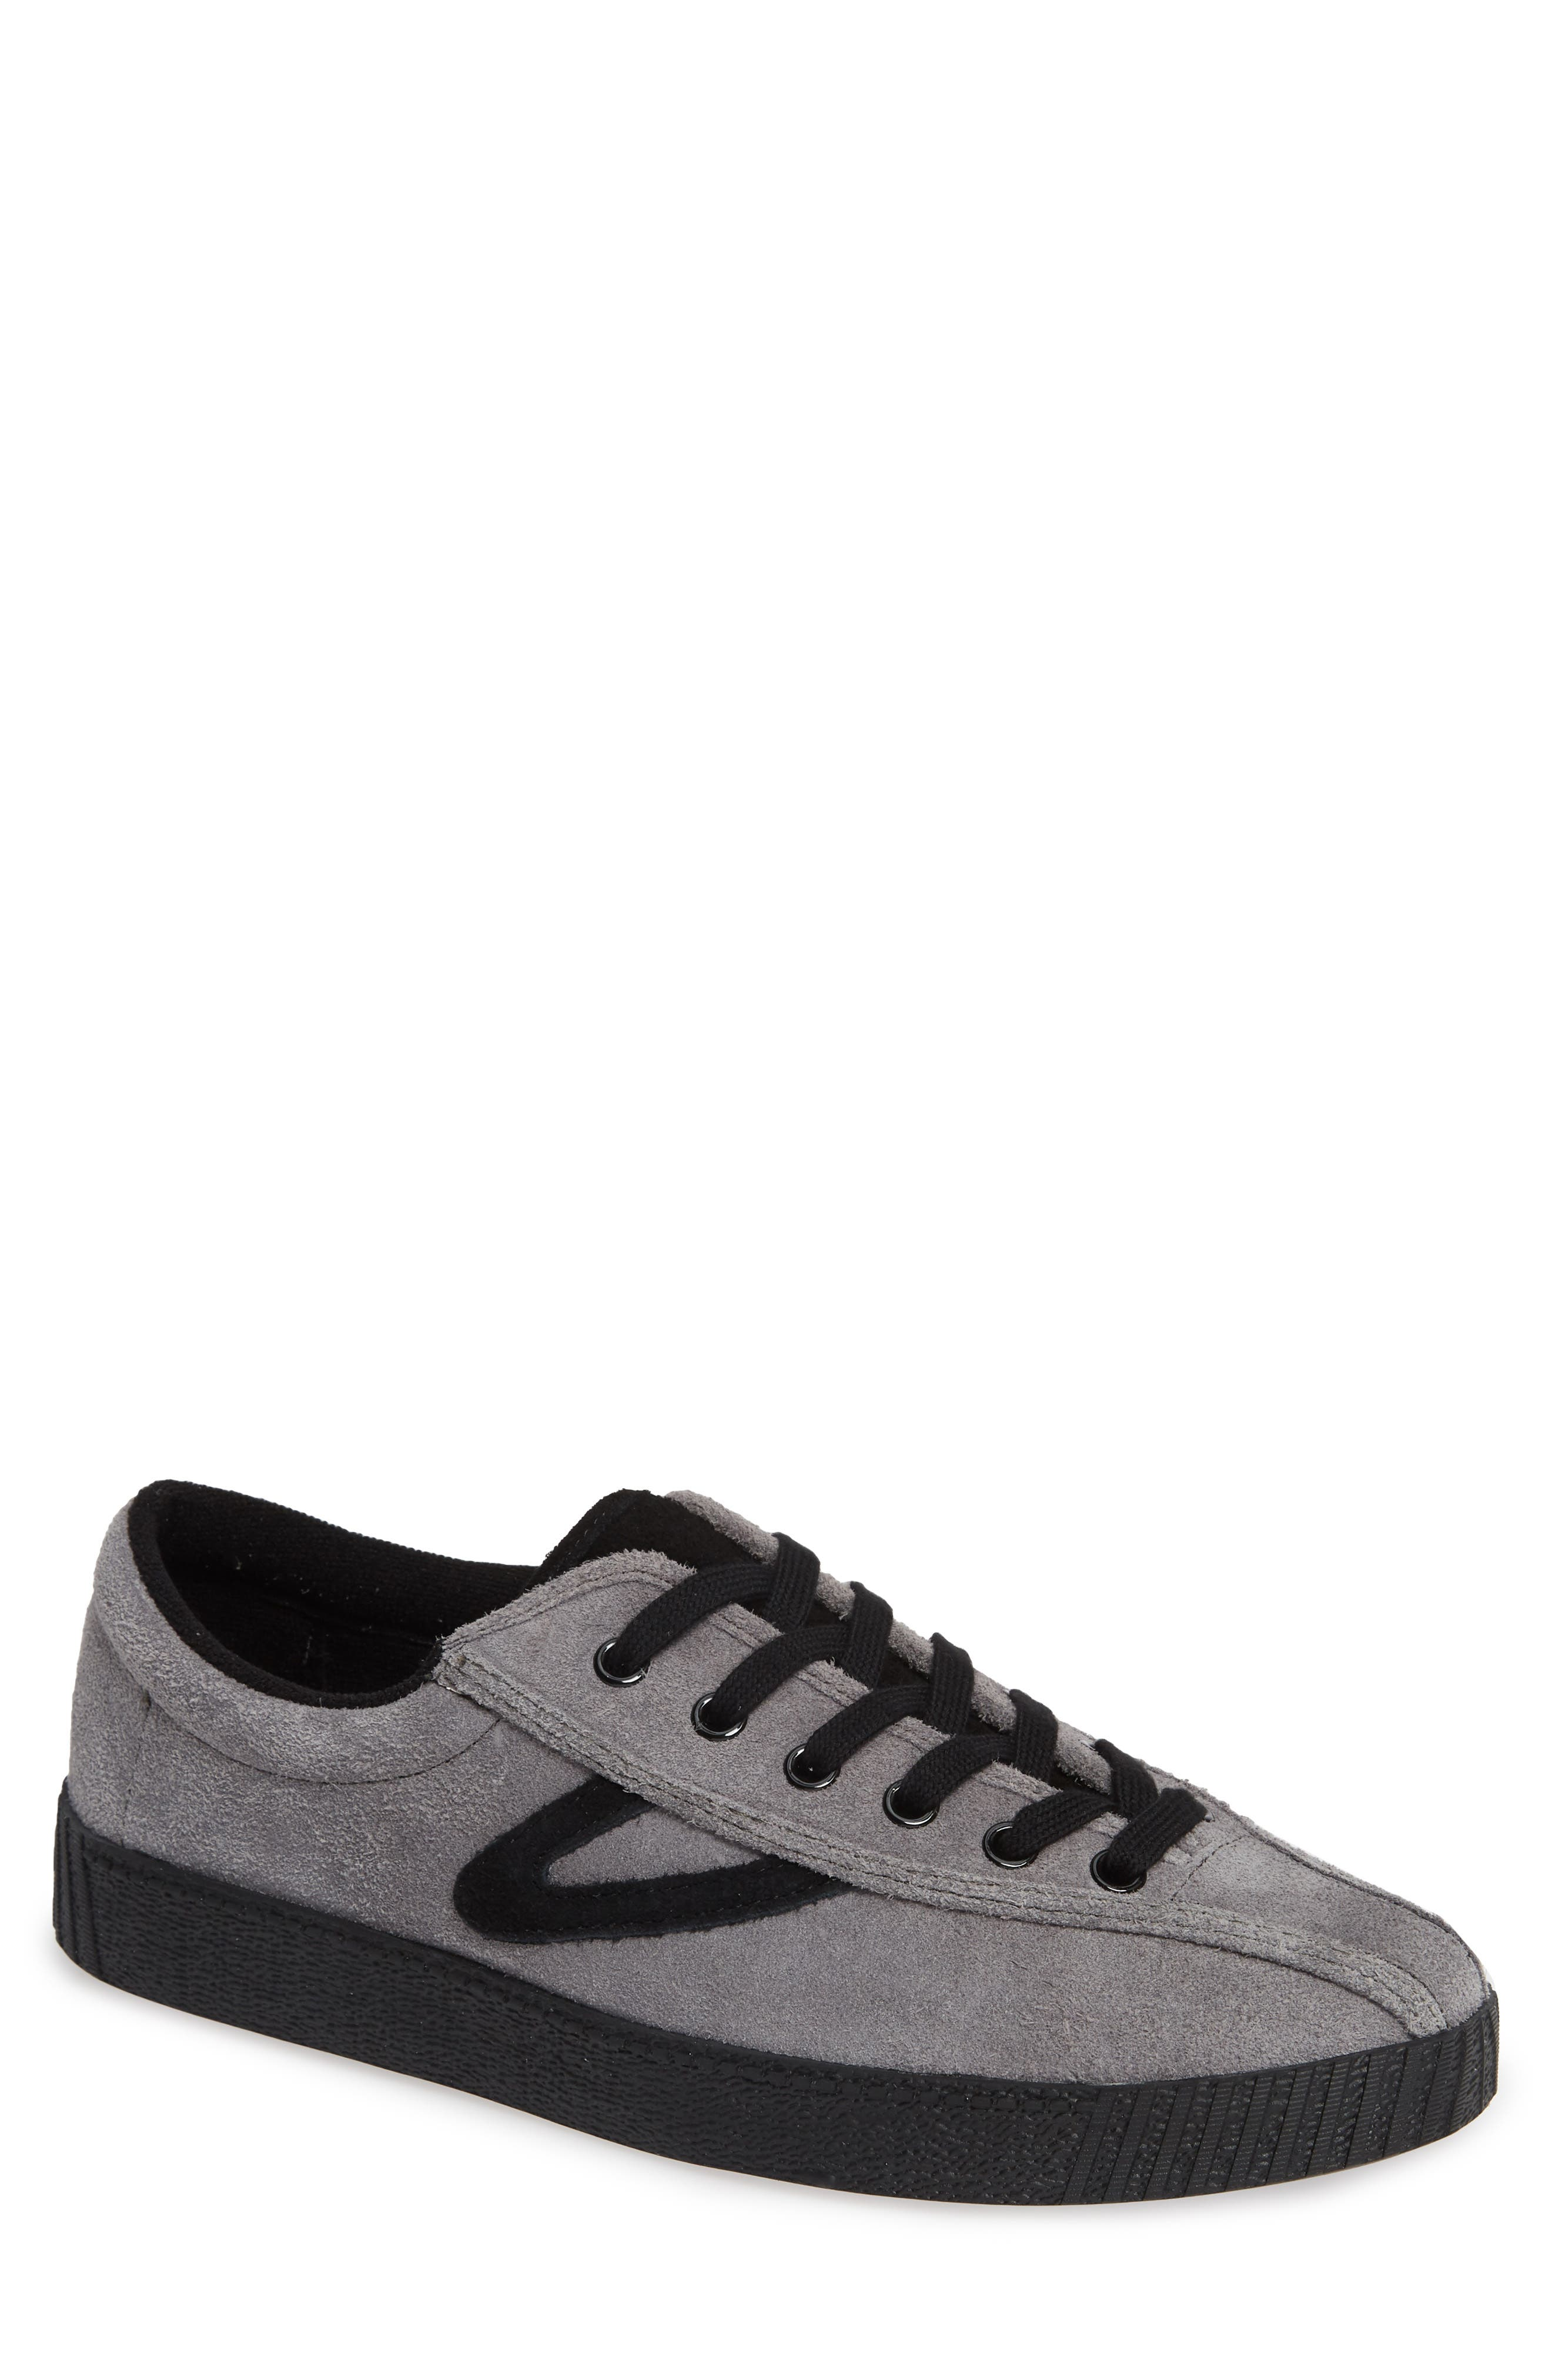 TRETORN Men'S Nylite 26 Plus Suede Sneakers in Gray